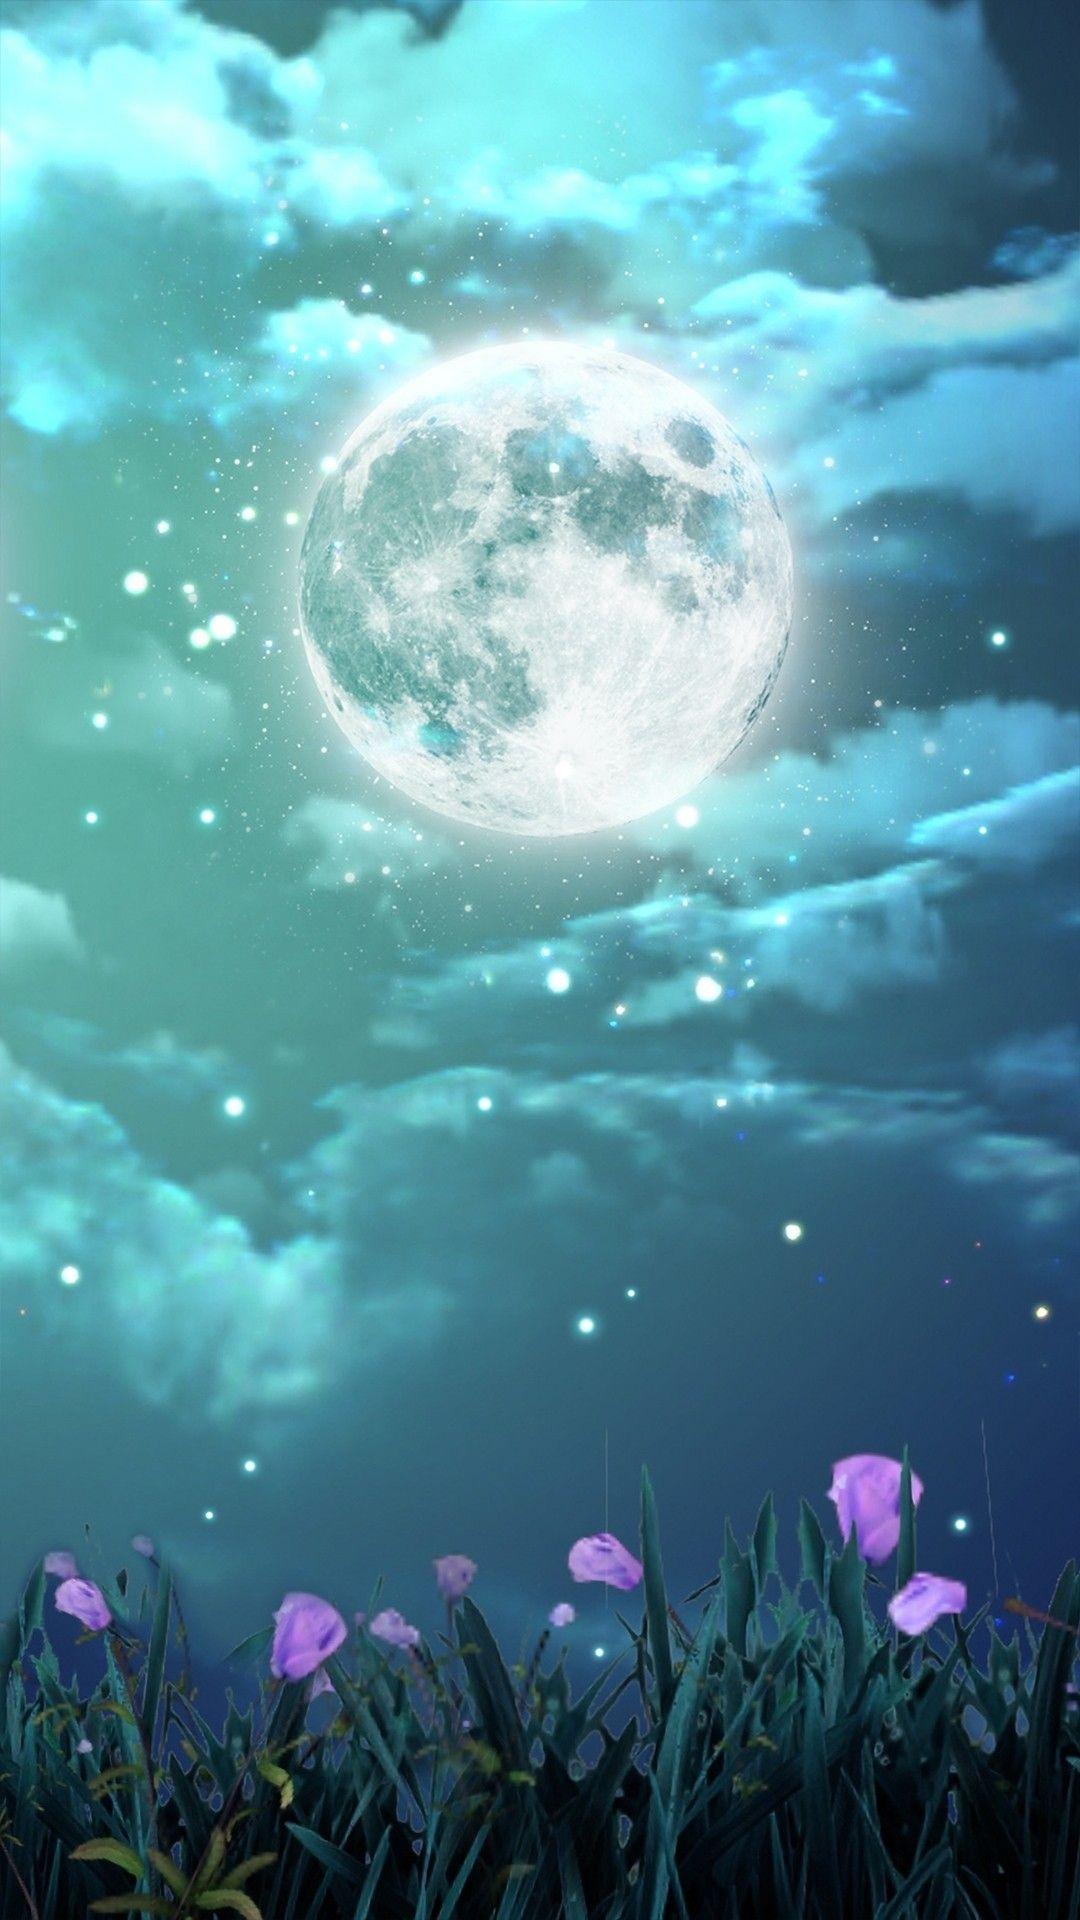 Fotos De Cindy Land Em Moon Wallpaper | Imagens Fantásticas, Fotografia Da Natureza, Wallpapers Natureza 54C